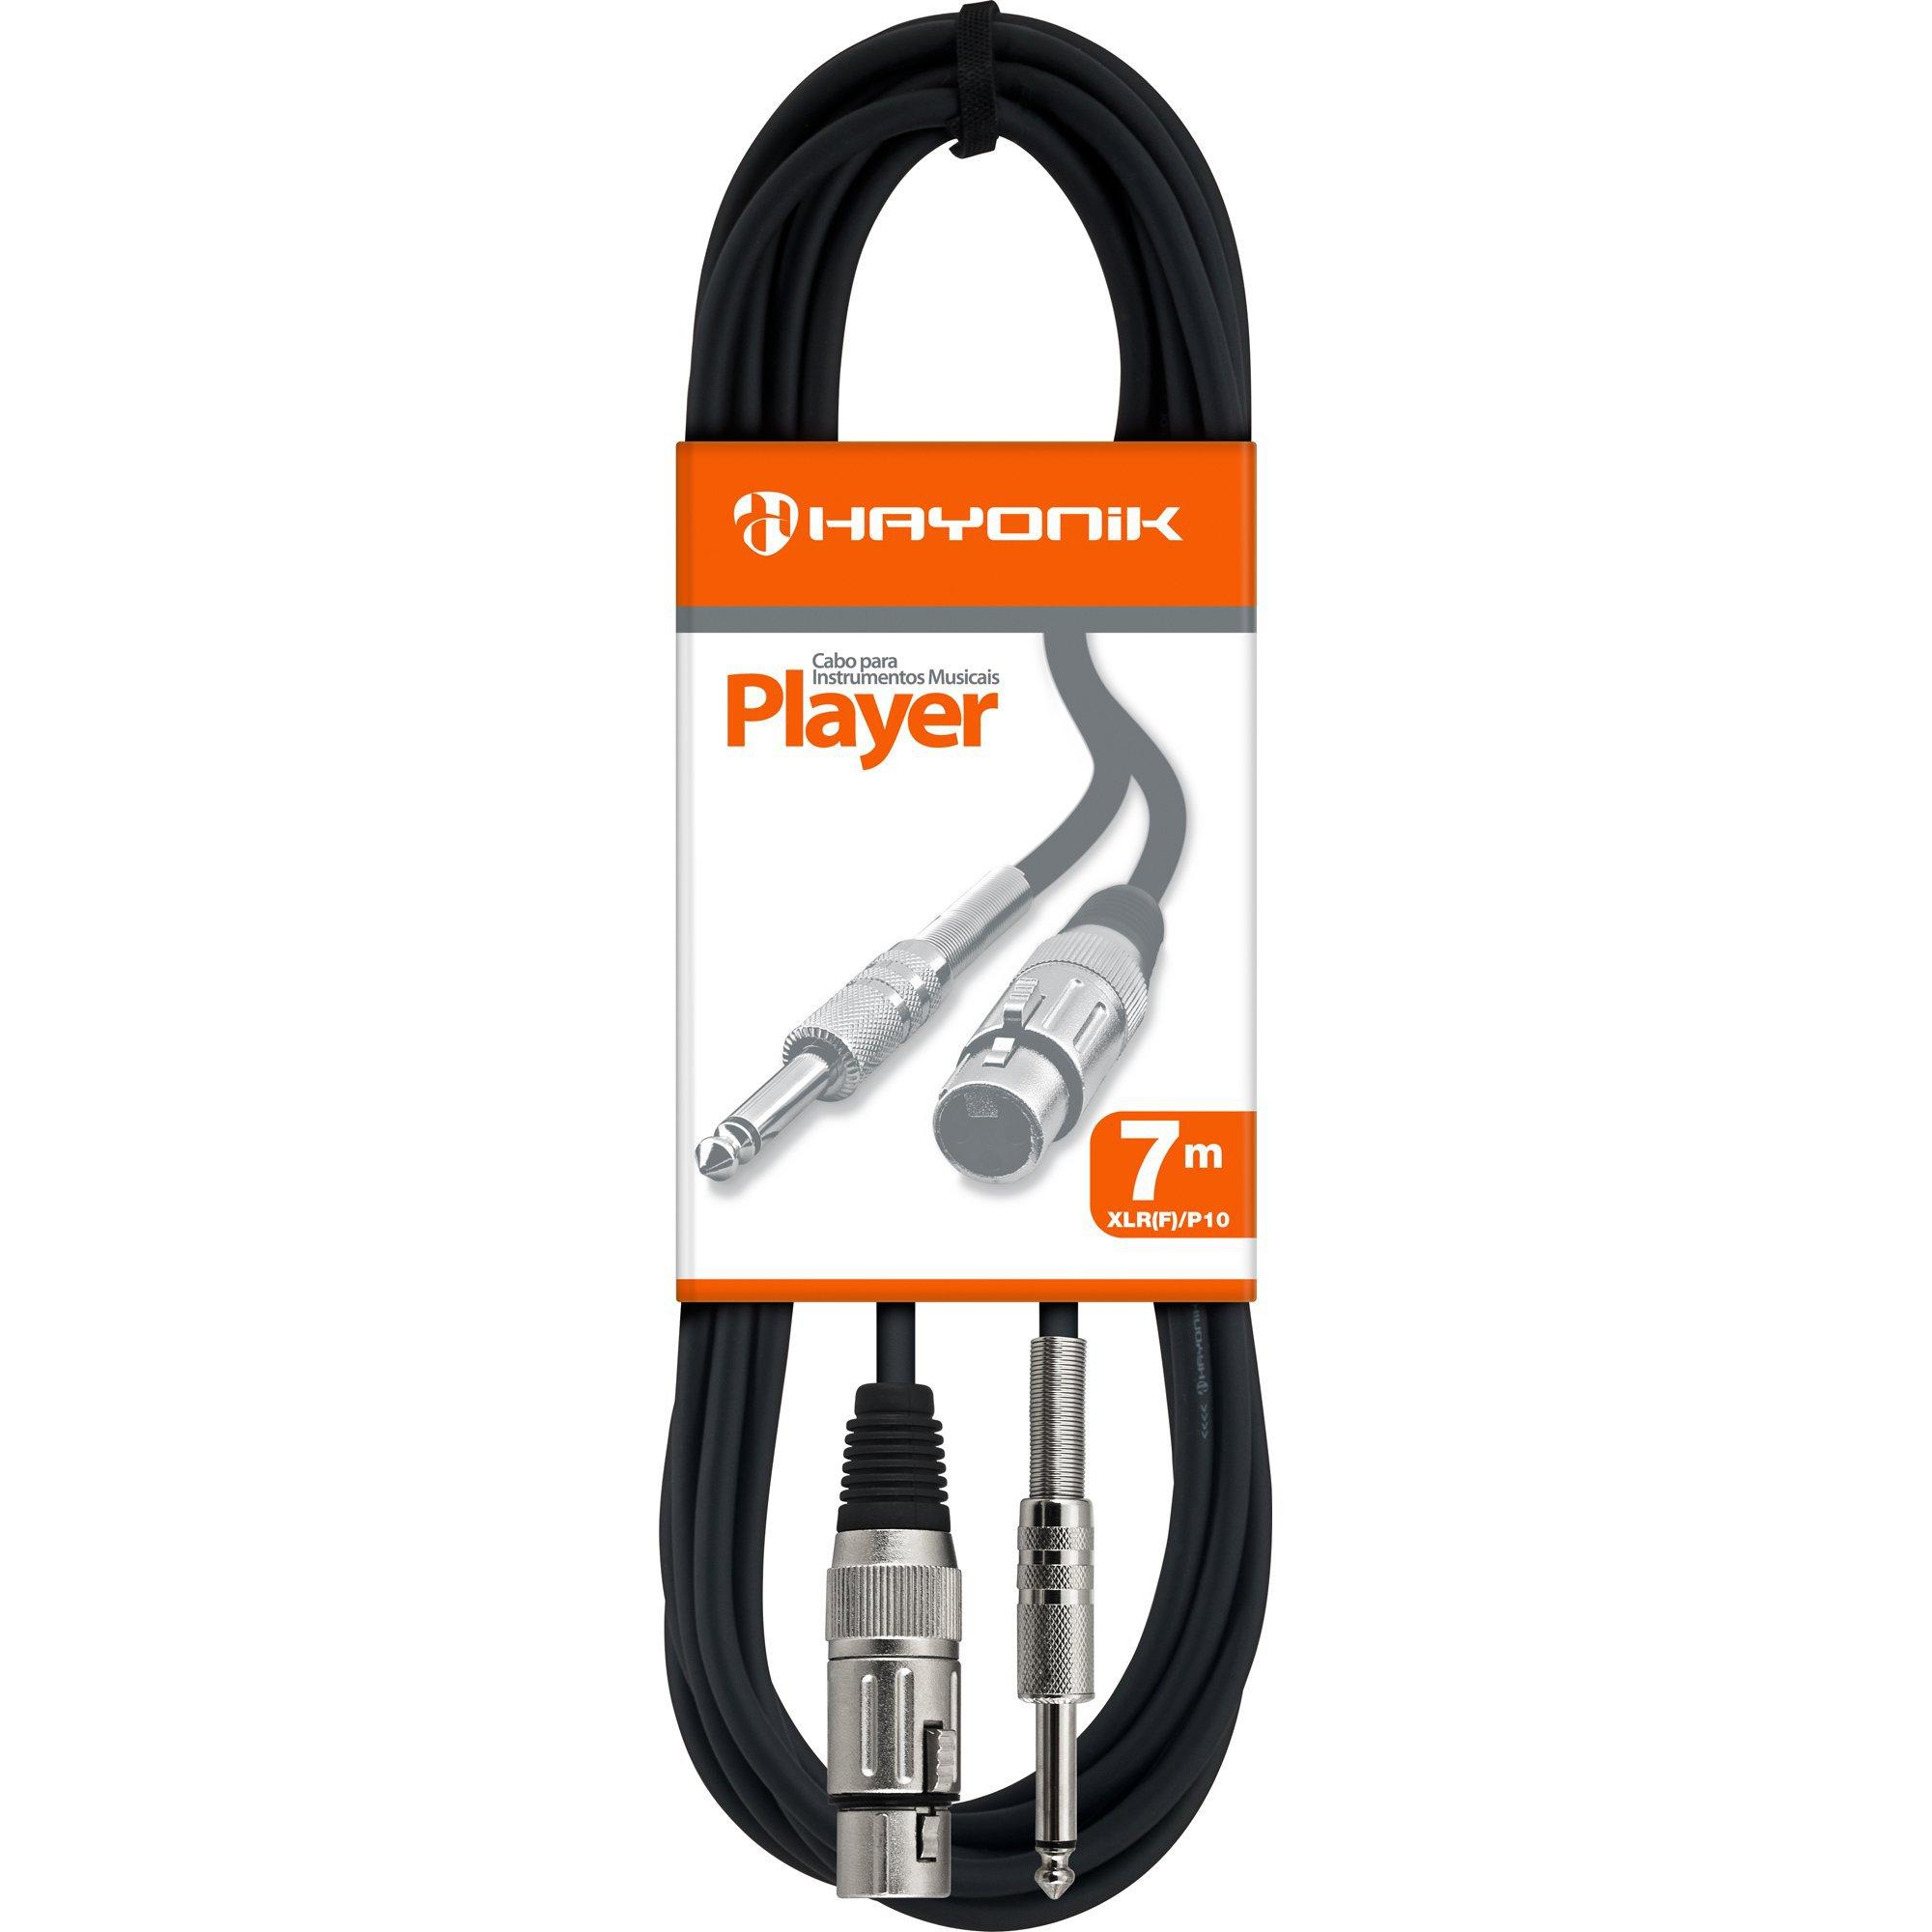 cabo para apenas 10 disponiveis hayonik player preto x p10 7m microfone xlrf 40745 2000 186447